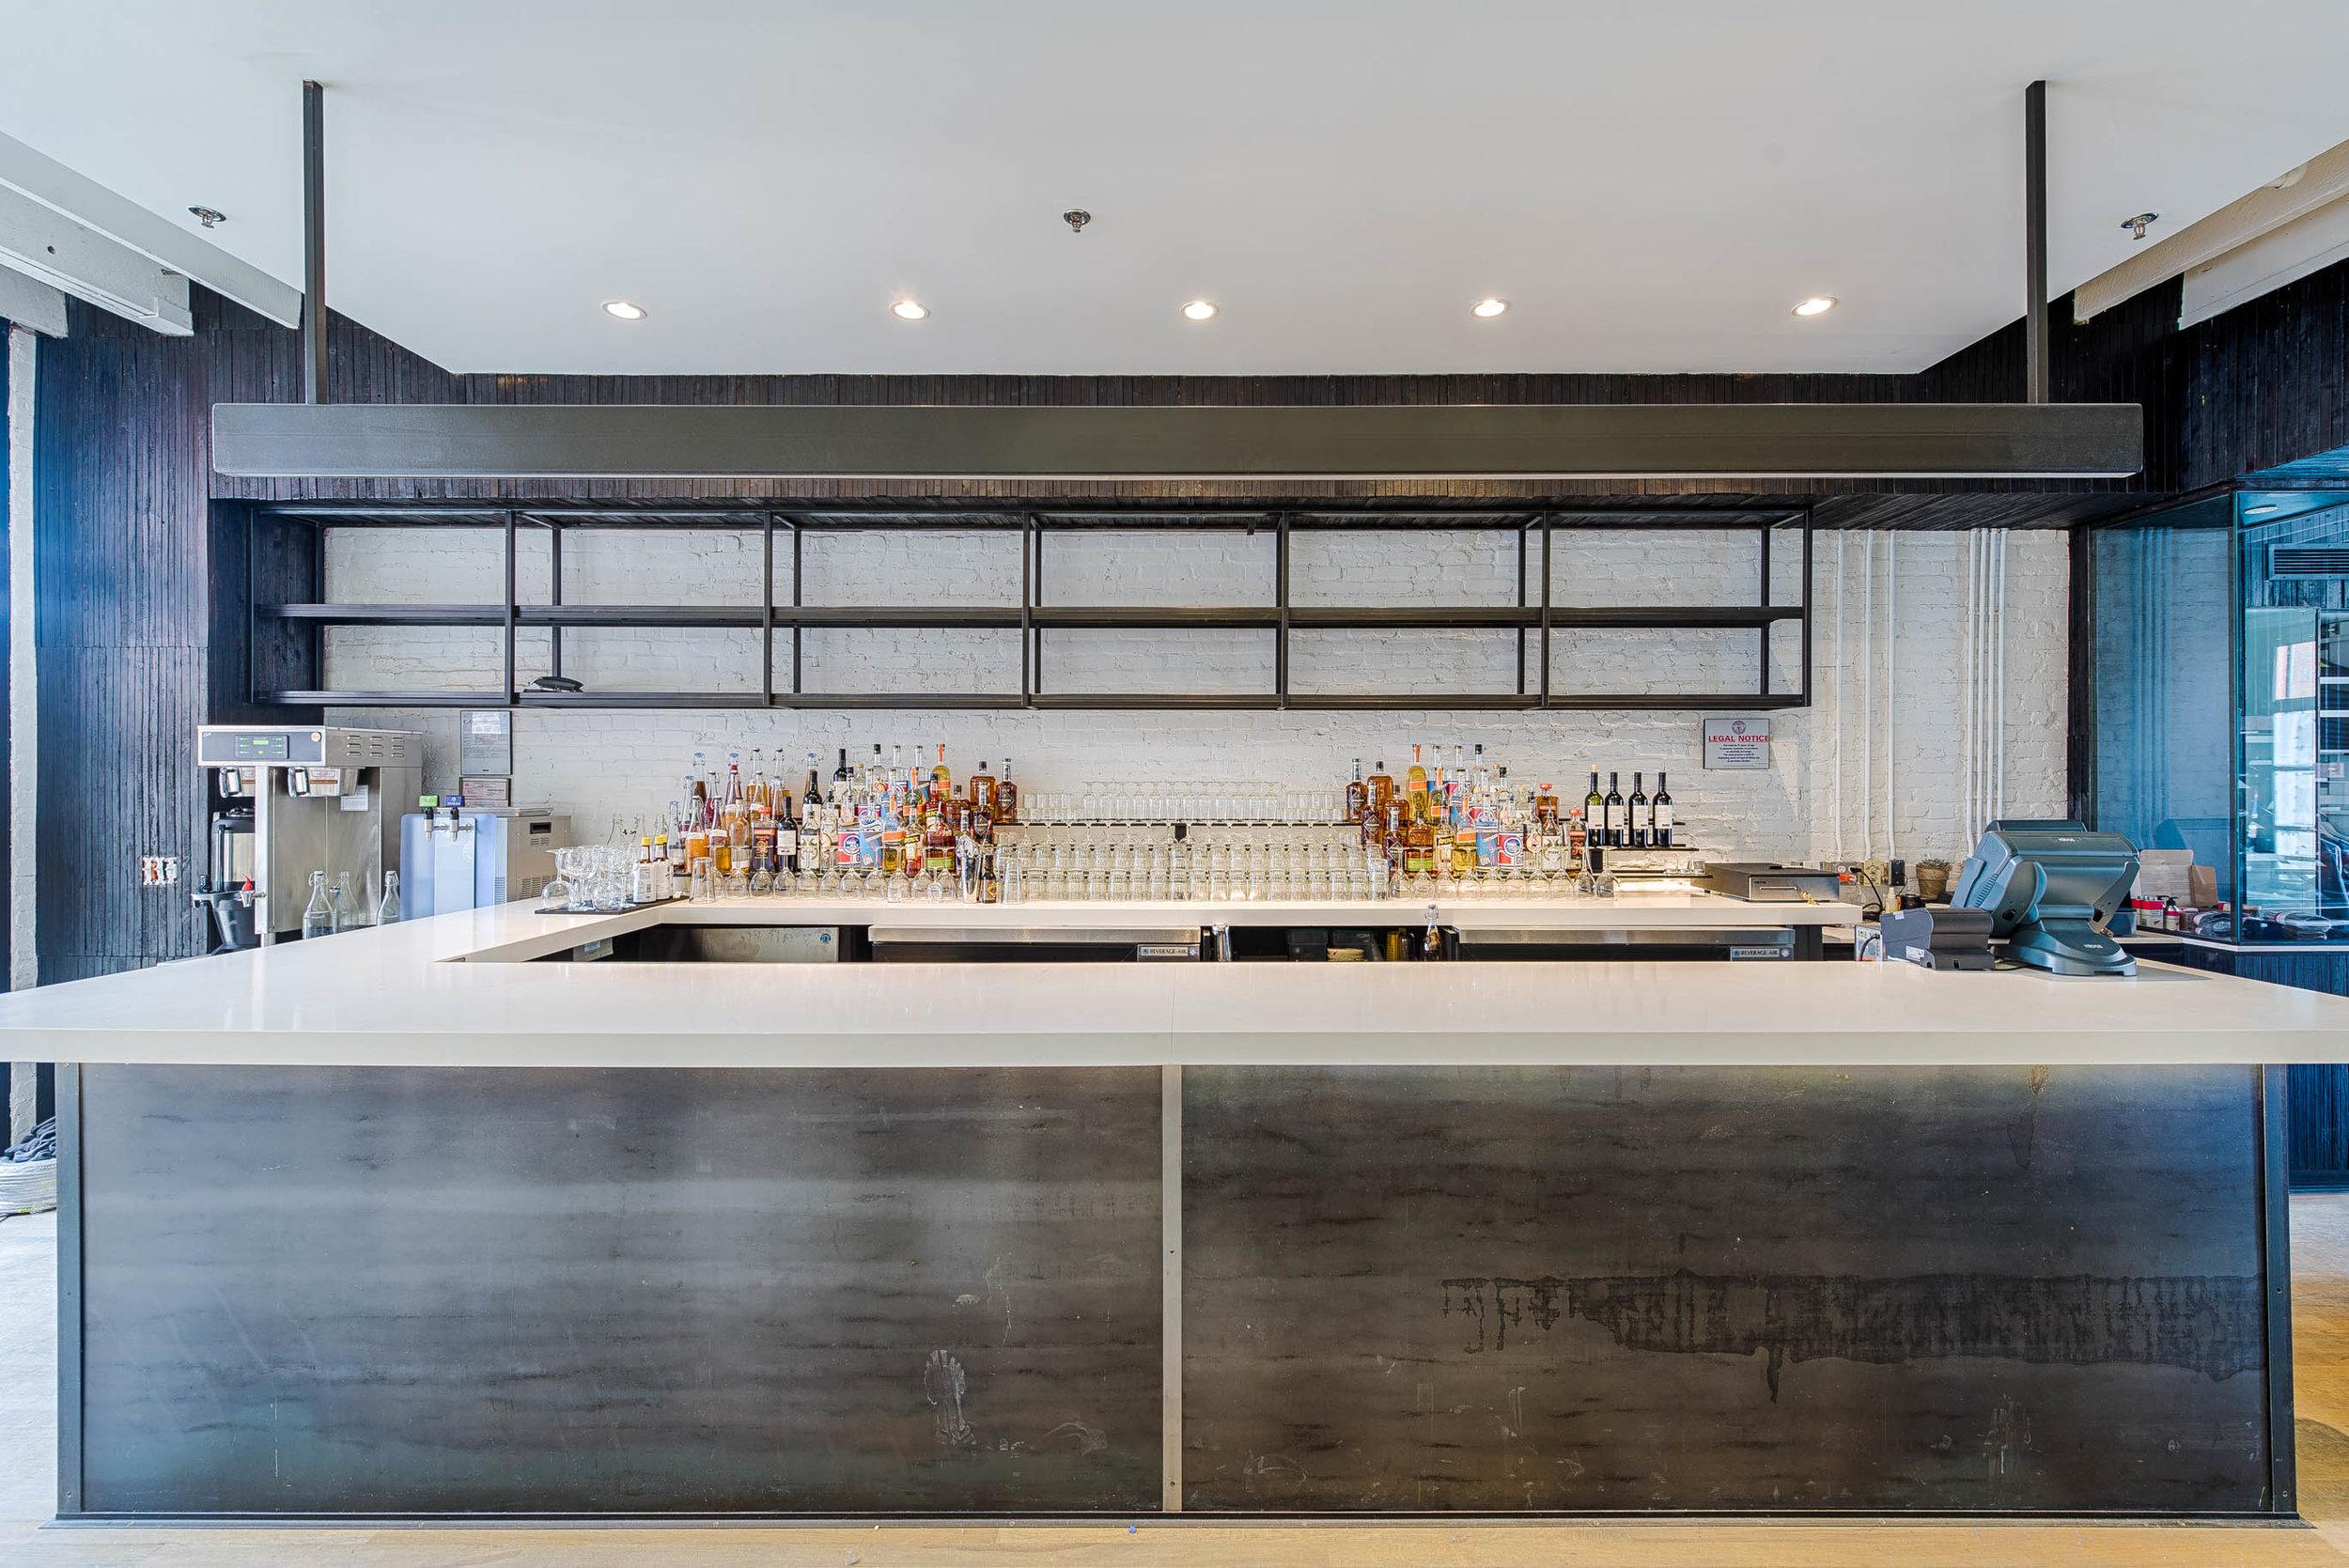 studio-saint-bars-and-restaurants-maketto-washington-dc-1